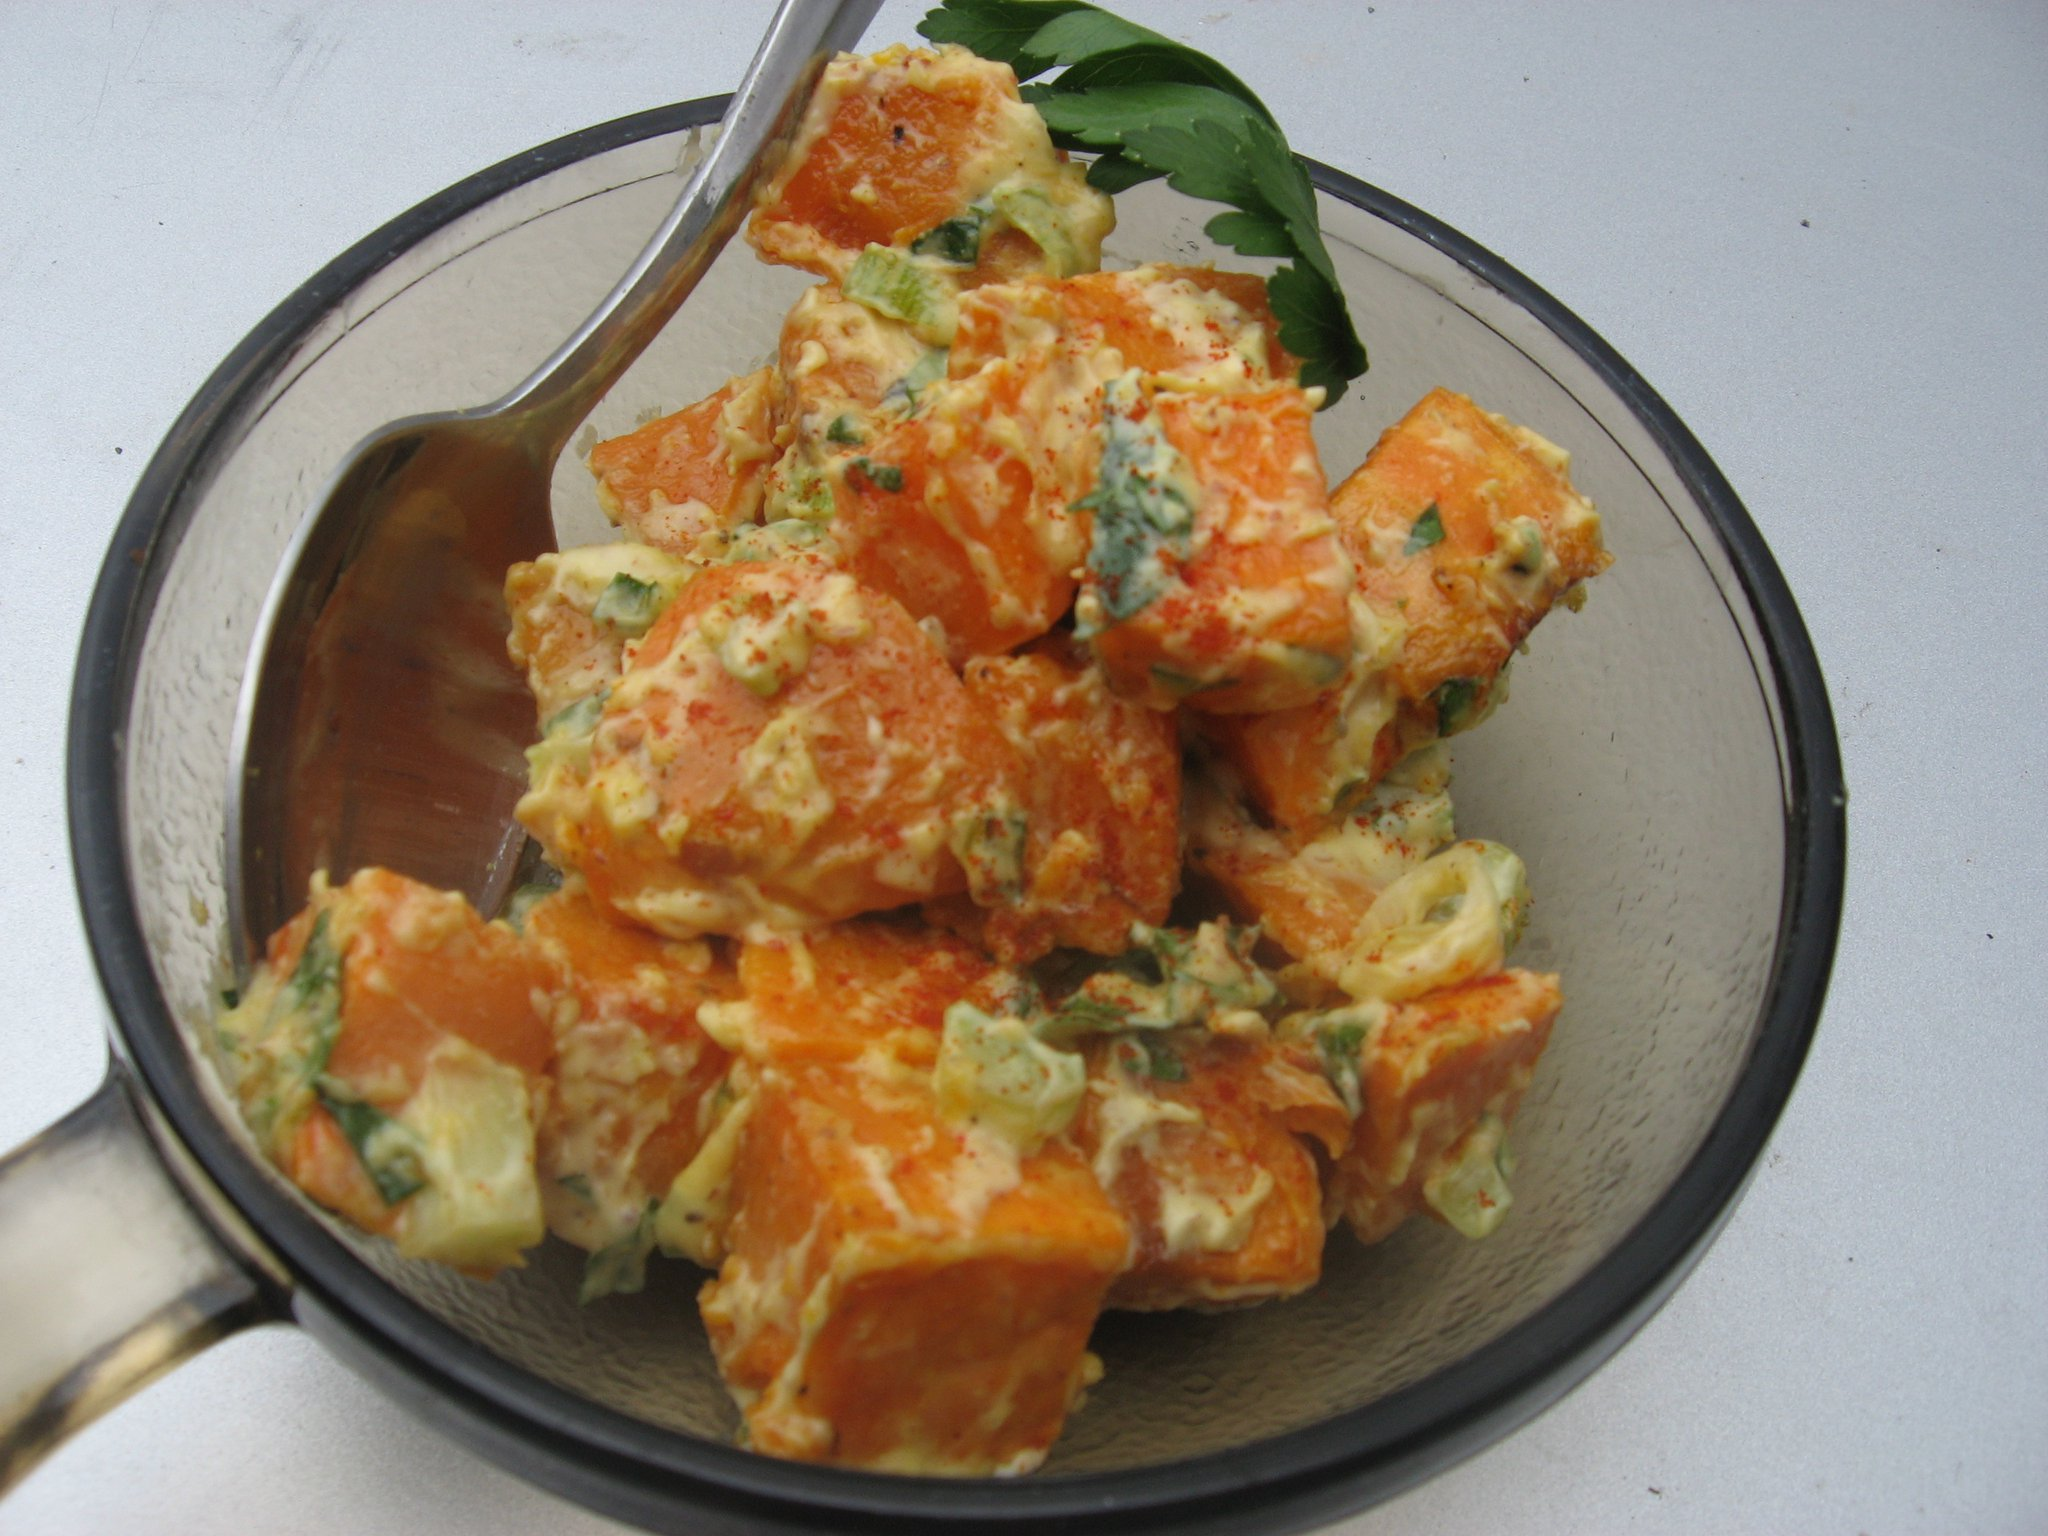 Creamy Dijon Sweet Potato Salad